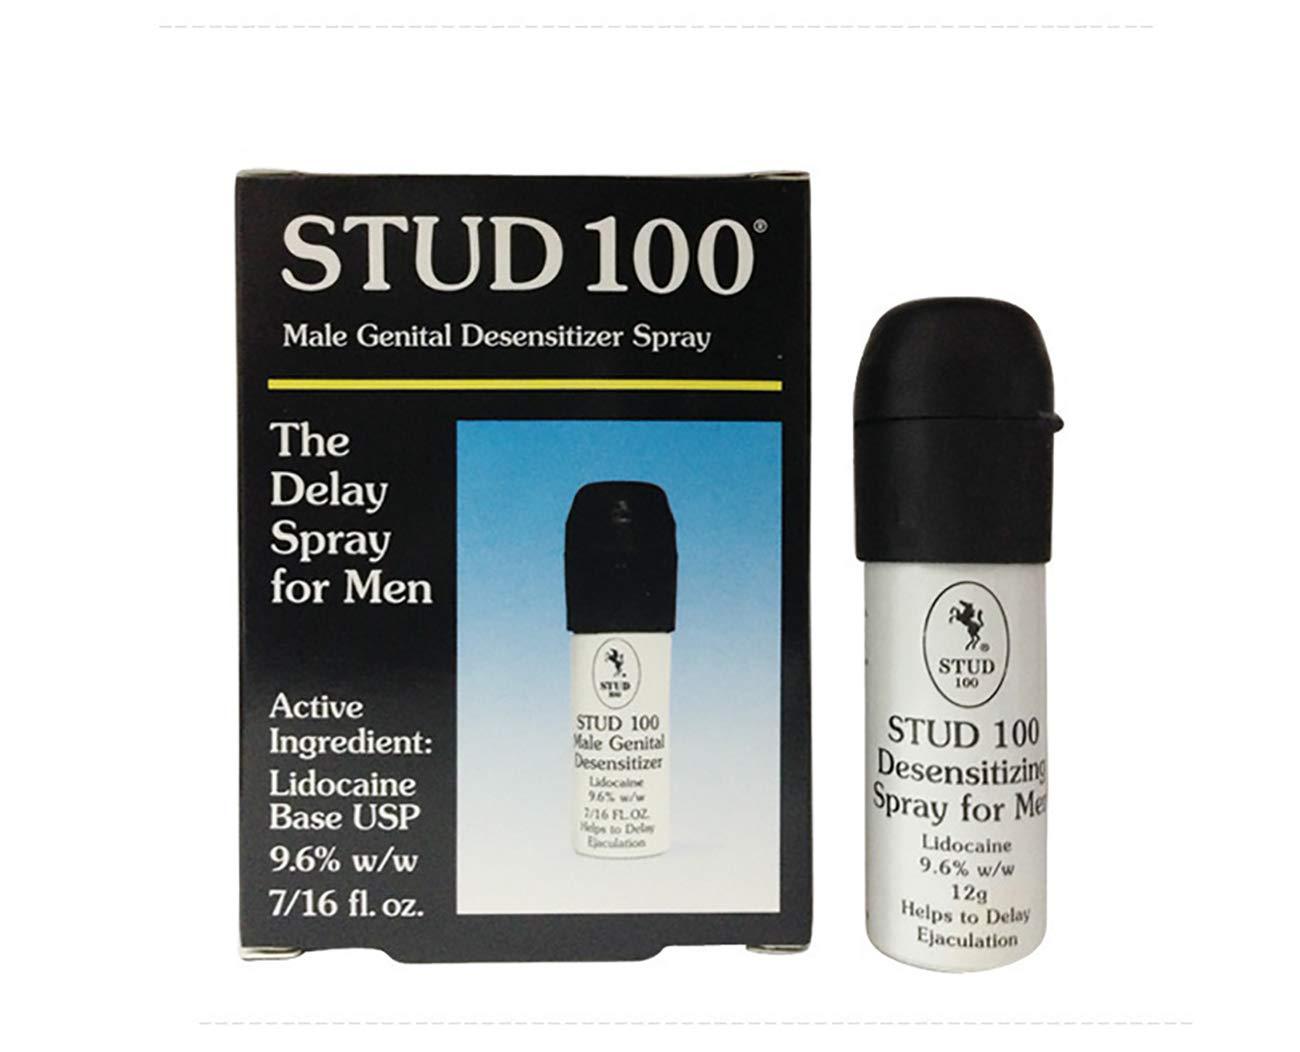 Stud 100 Male Genital Desensitizer Spray, 7/16- Fl. Ounce Box (Pack of 2)